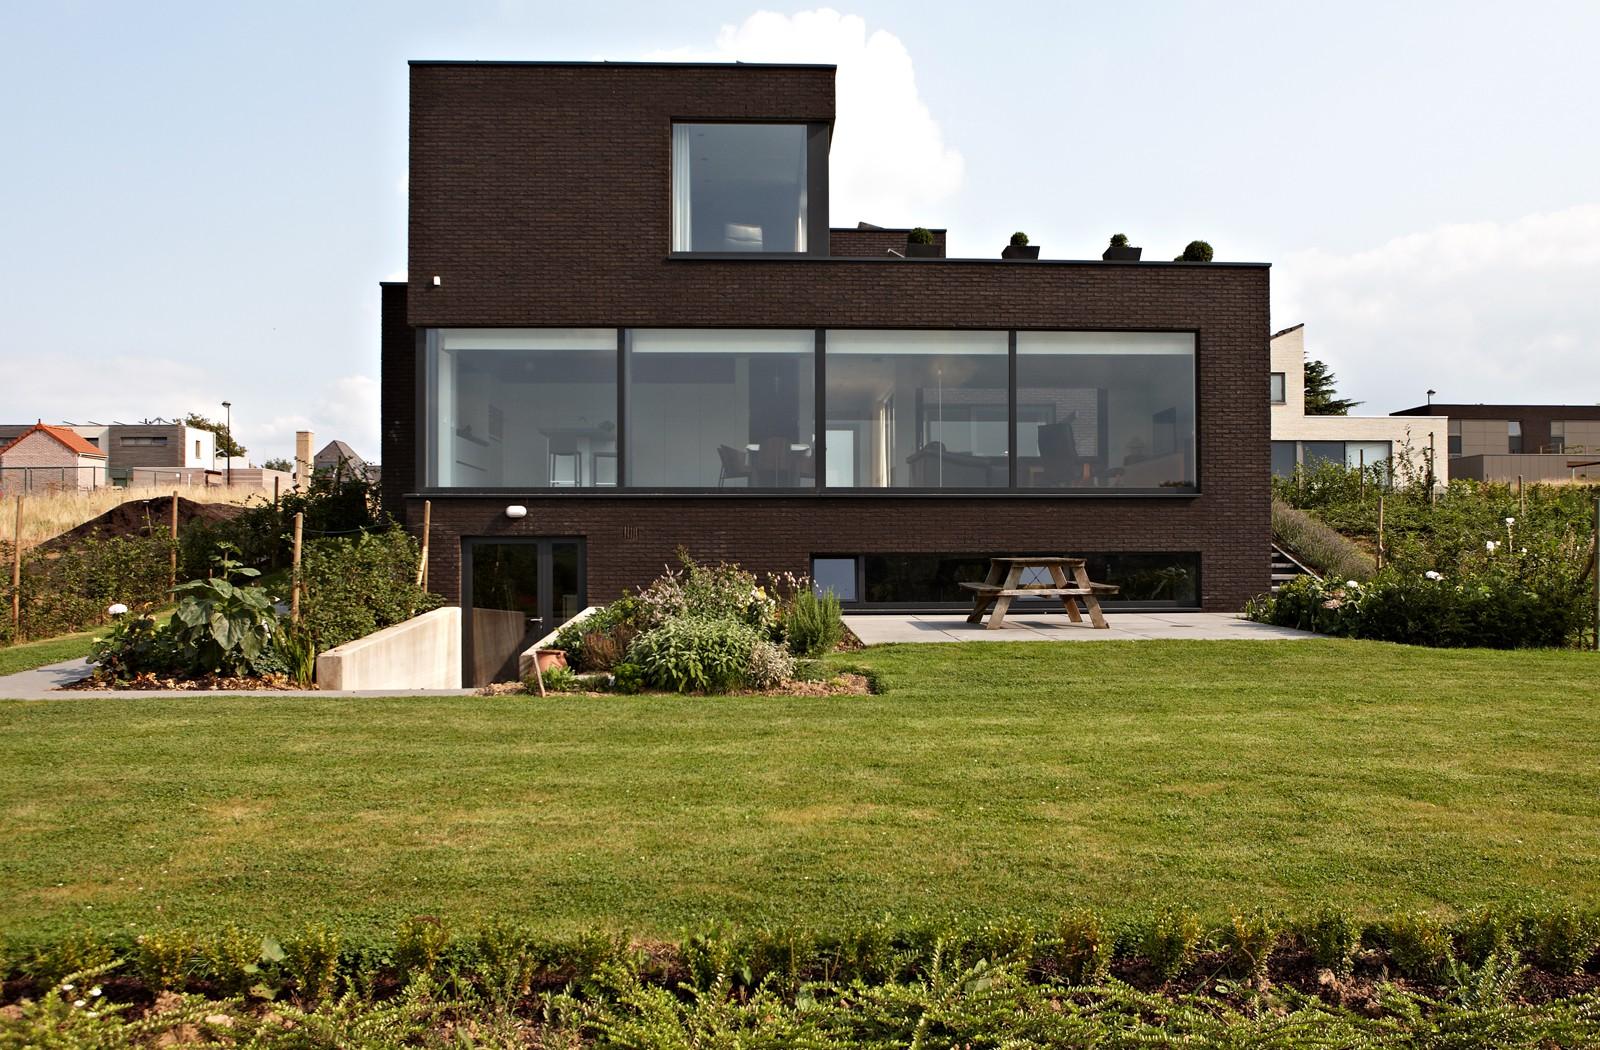 Dumobil villabouw woonprojecten for Moderne villabouw